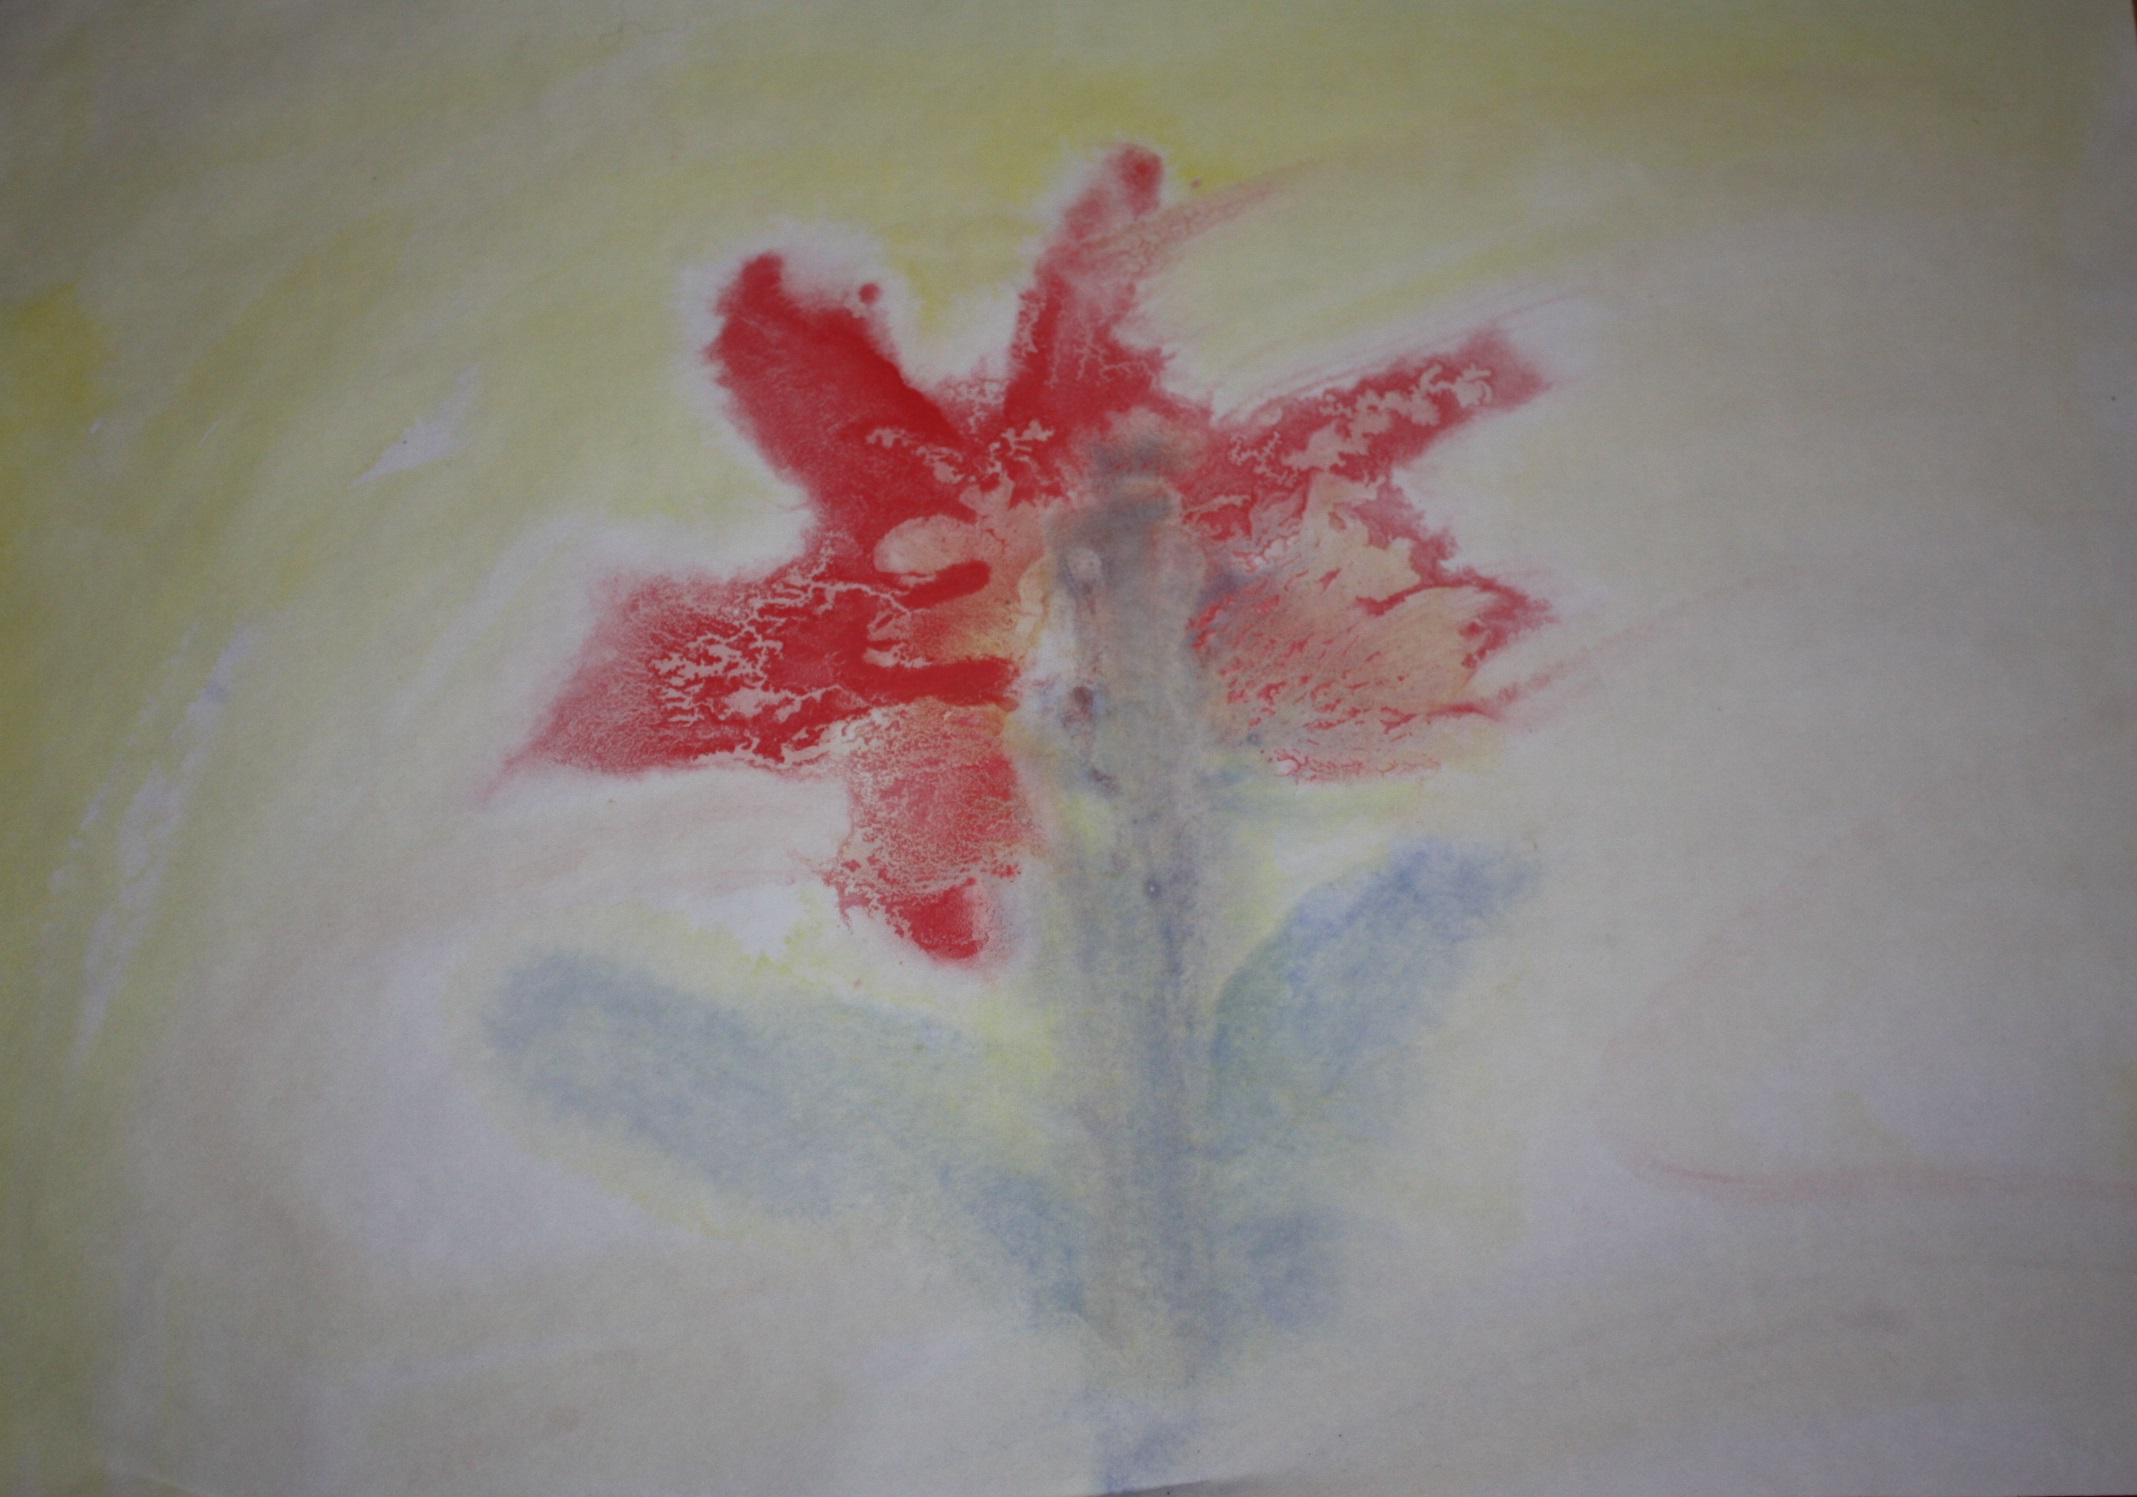 Floarea rosie